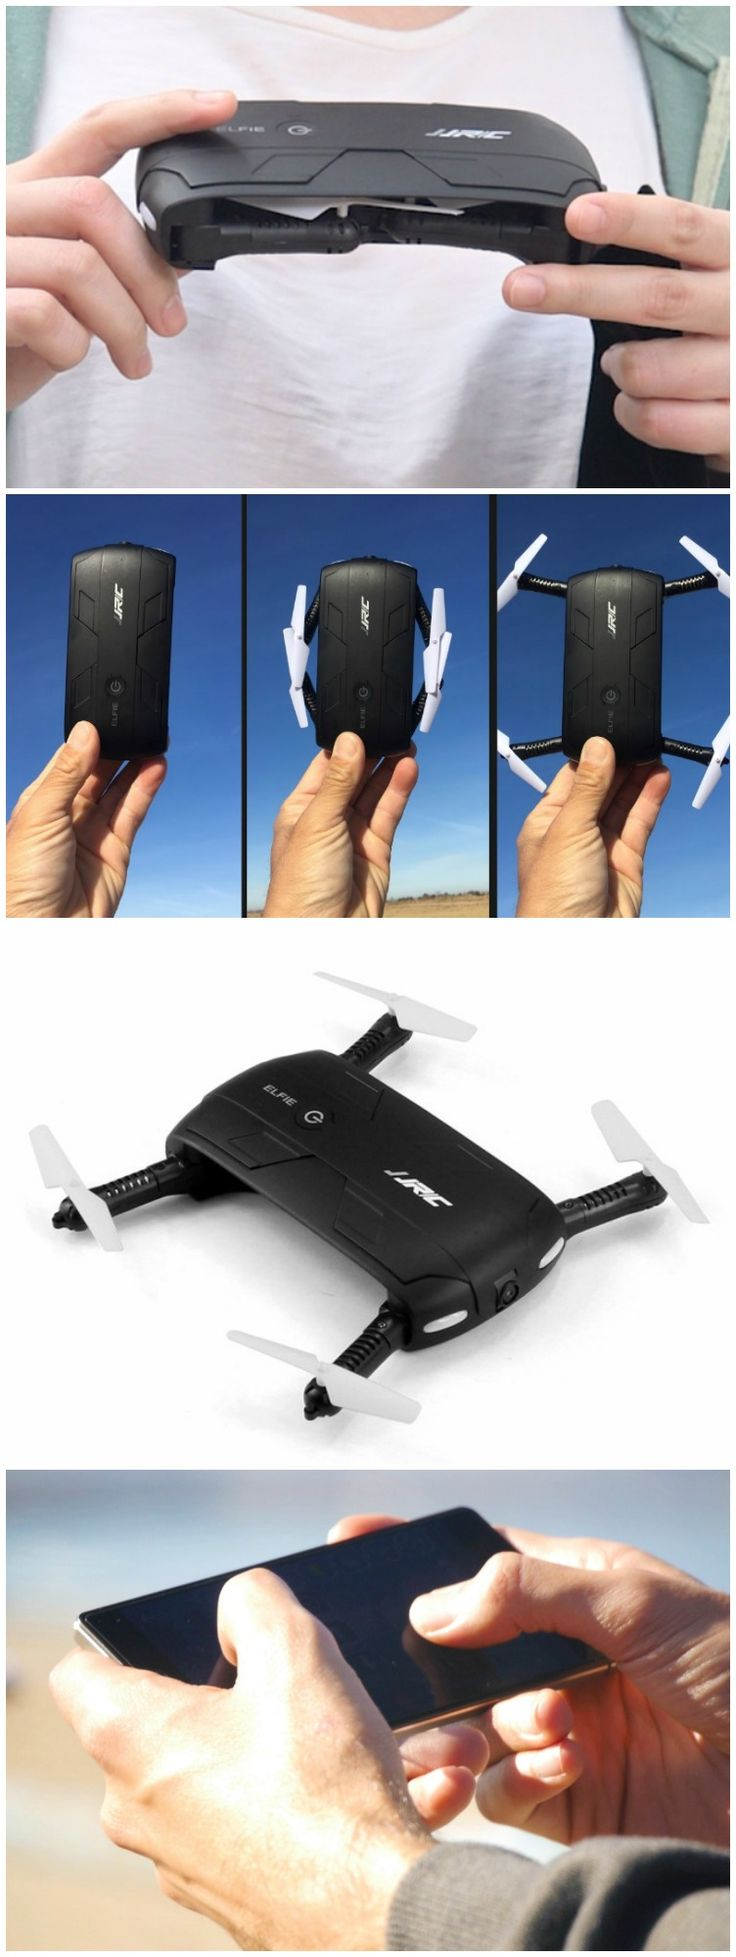 ELFIE Foldable Mini RC Selfie Drone